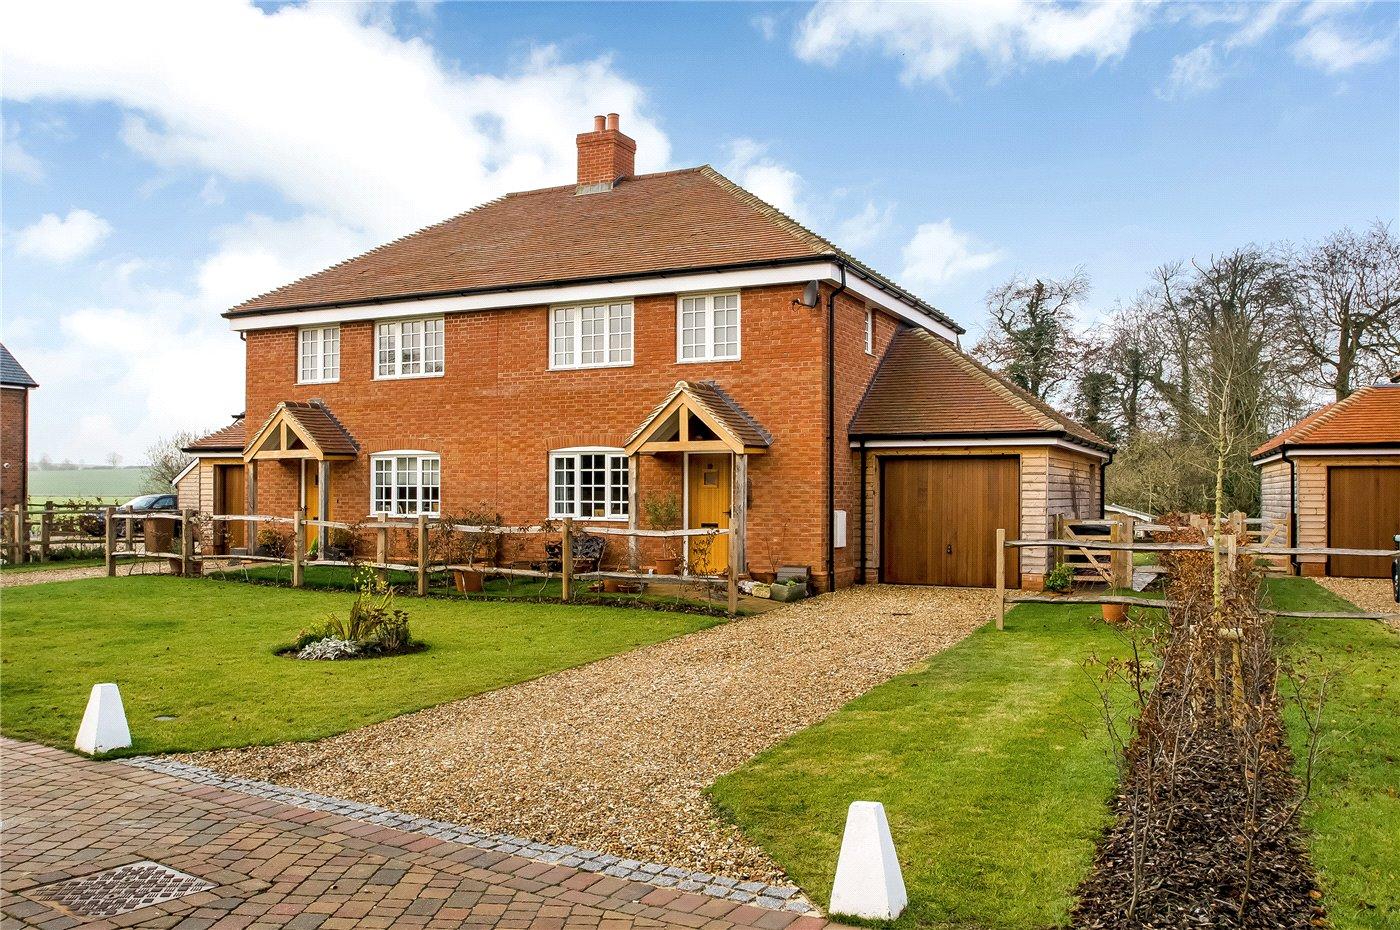 3 Bedroom Property For Sale In Ringbourne Copse Barton